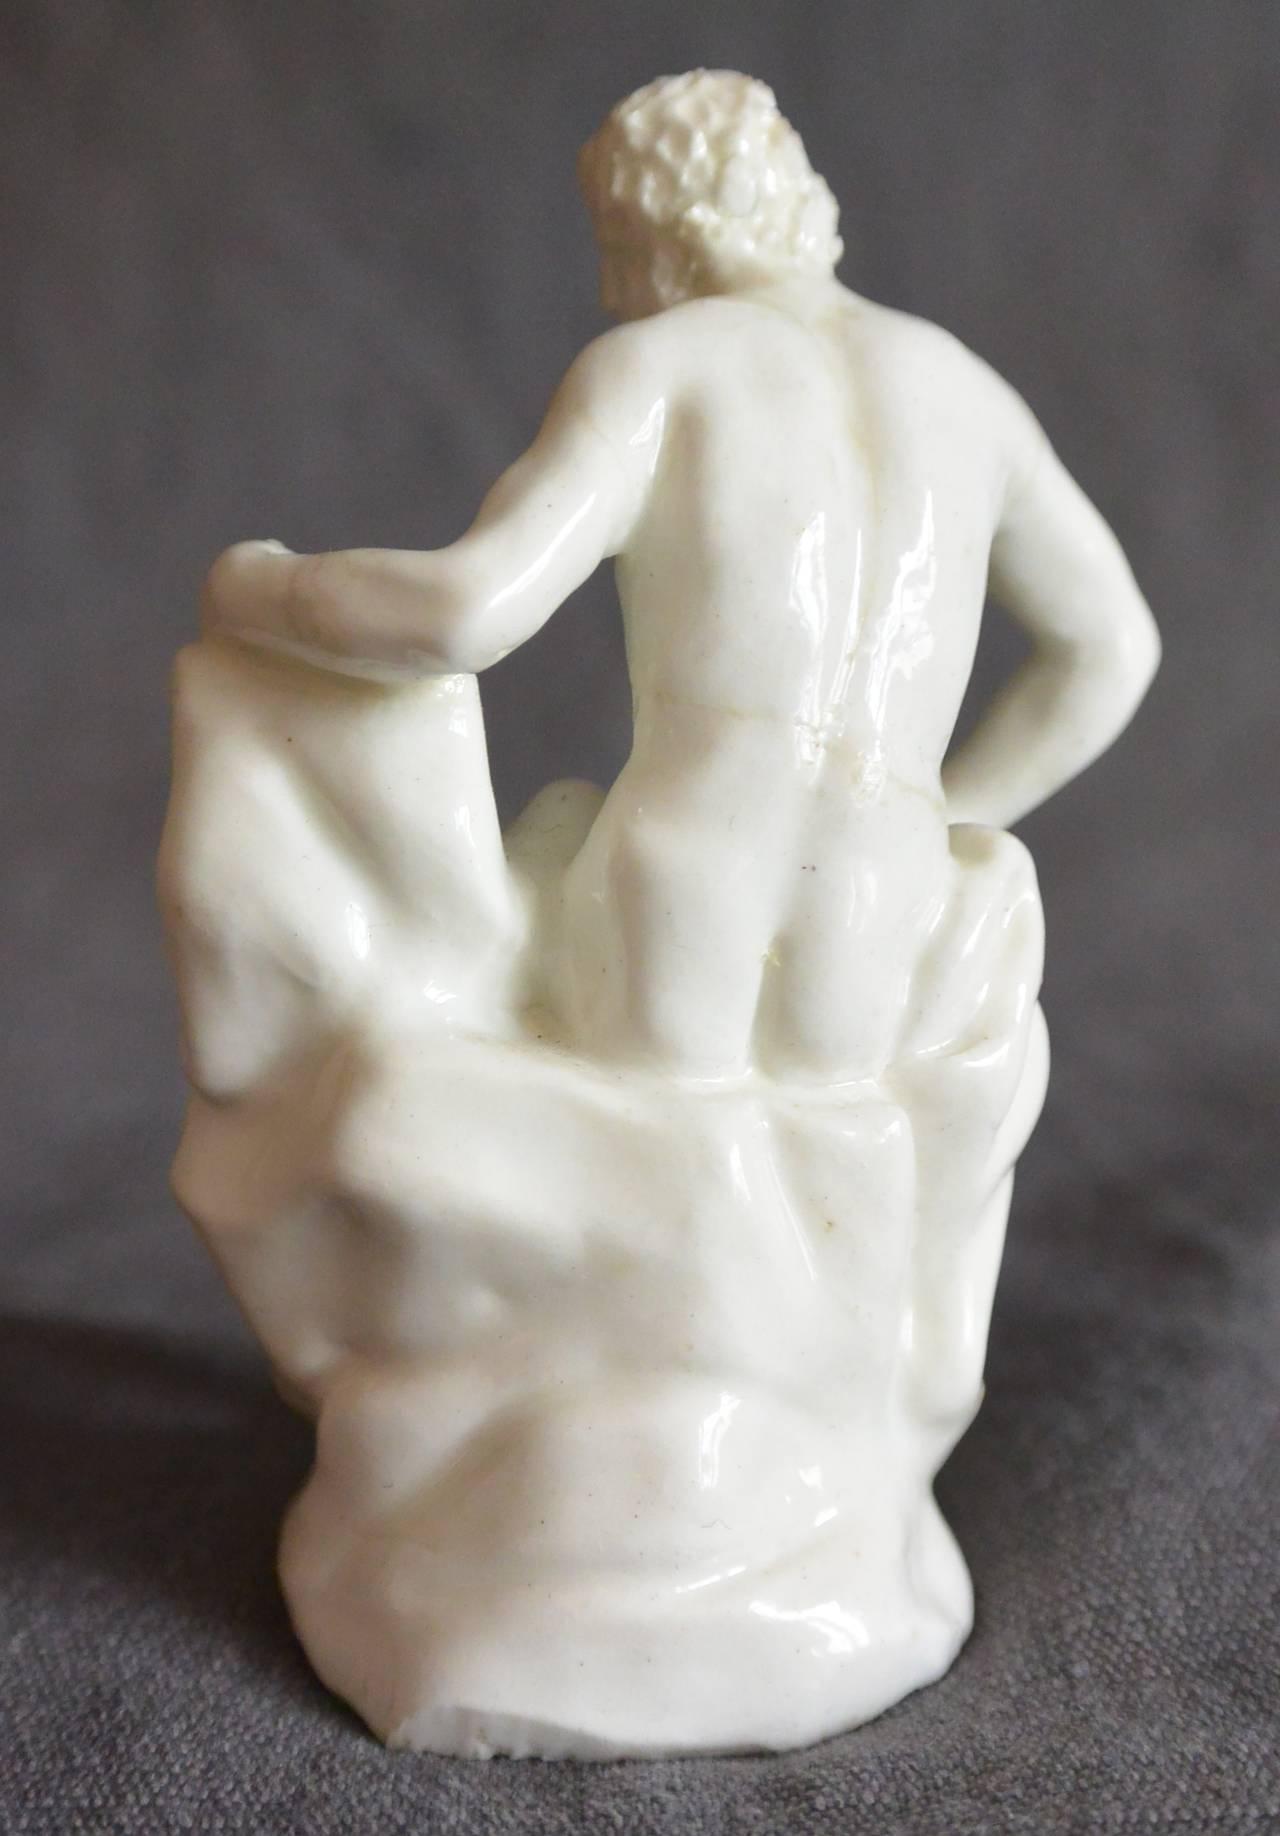 Baroque Real Fabbrica Porcelain Sculpture of a River God